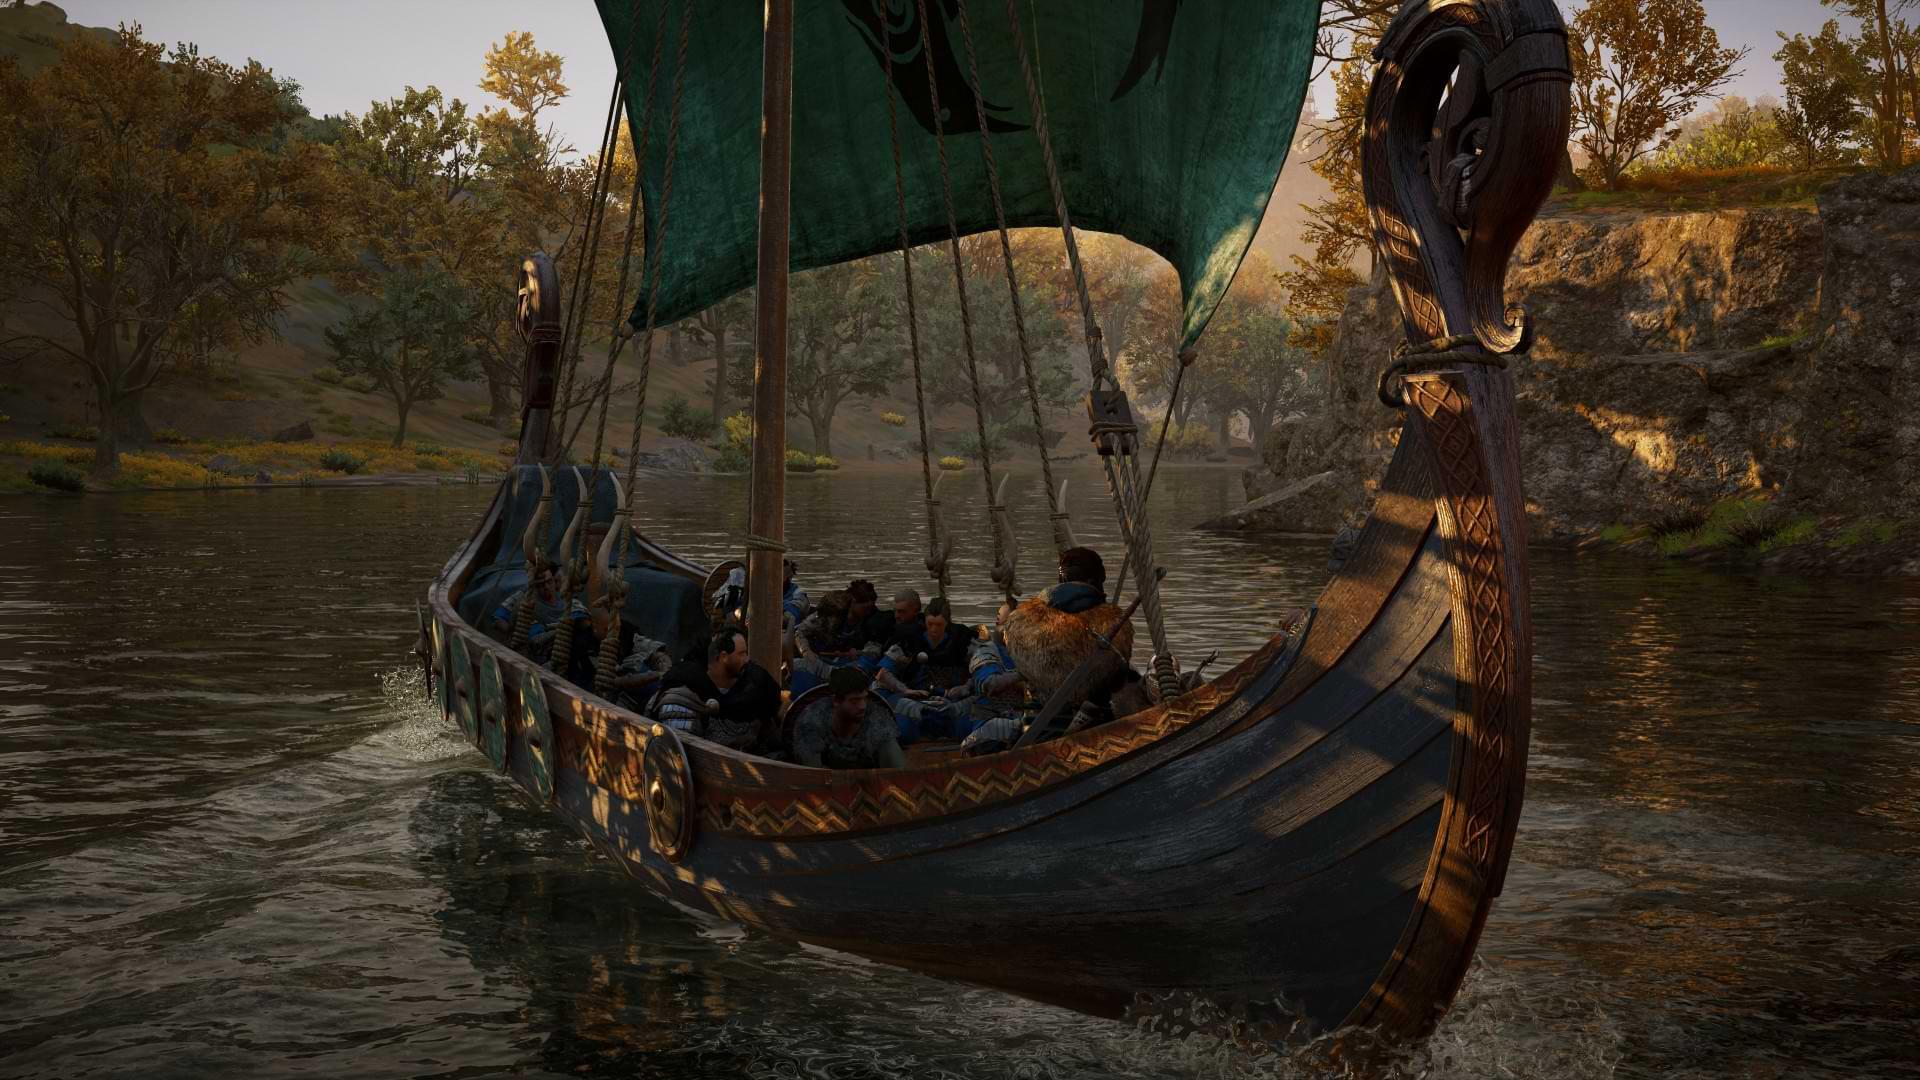 Assassin's Creed Valhalla - Rafting